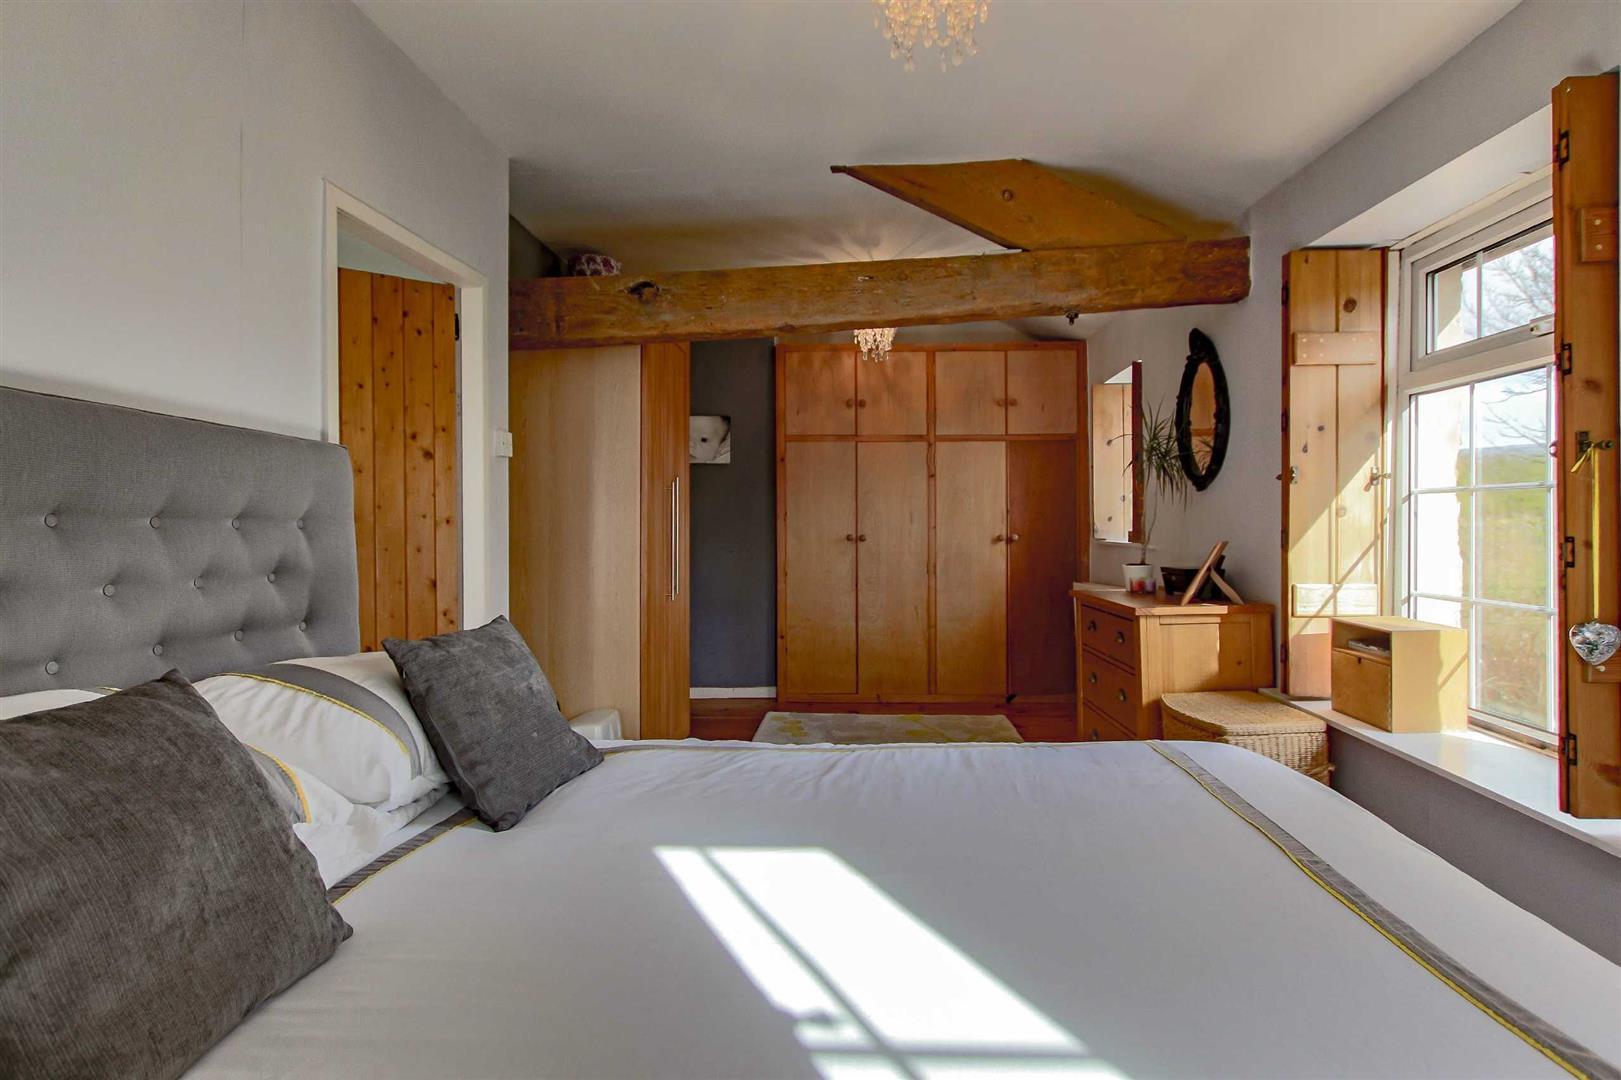 4 Bedroom Detached House For Sale - p033686_24.jpg